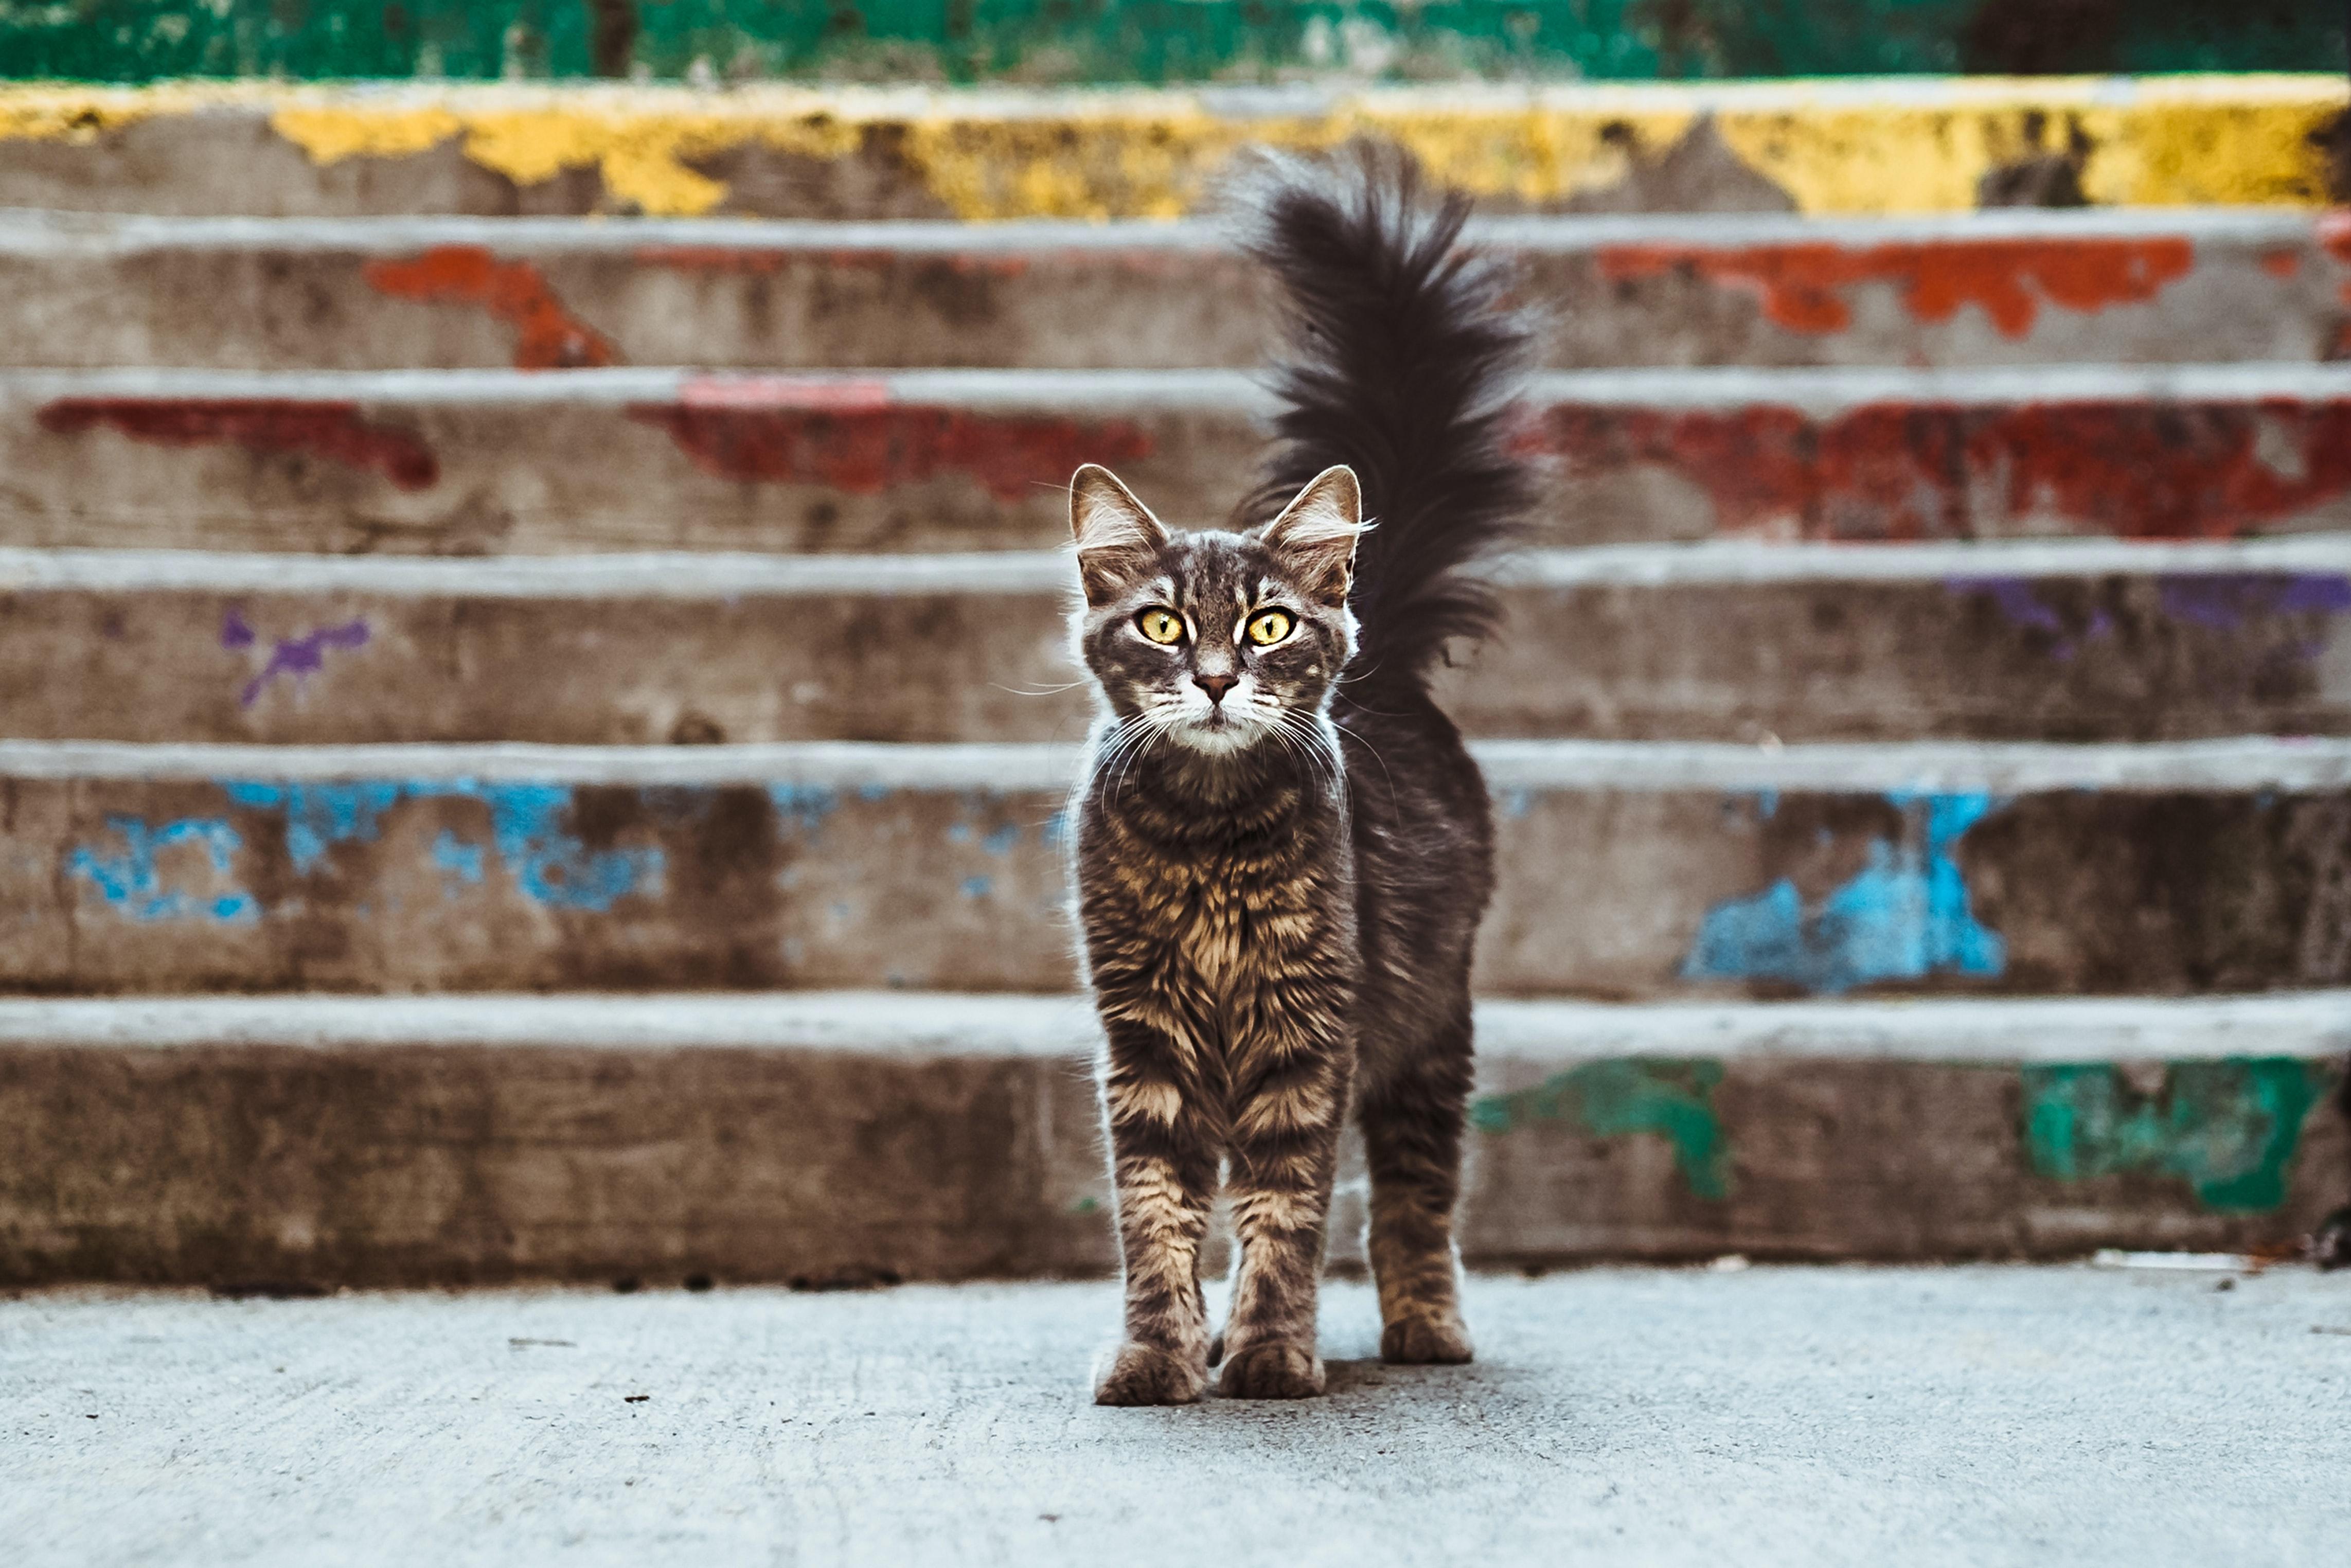 Beautiful cat by steps; image by Maria Teneva, via Unsplash.com.